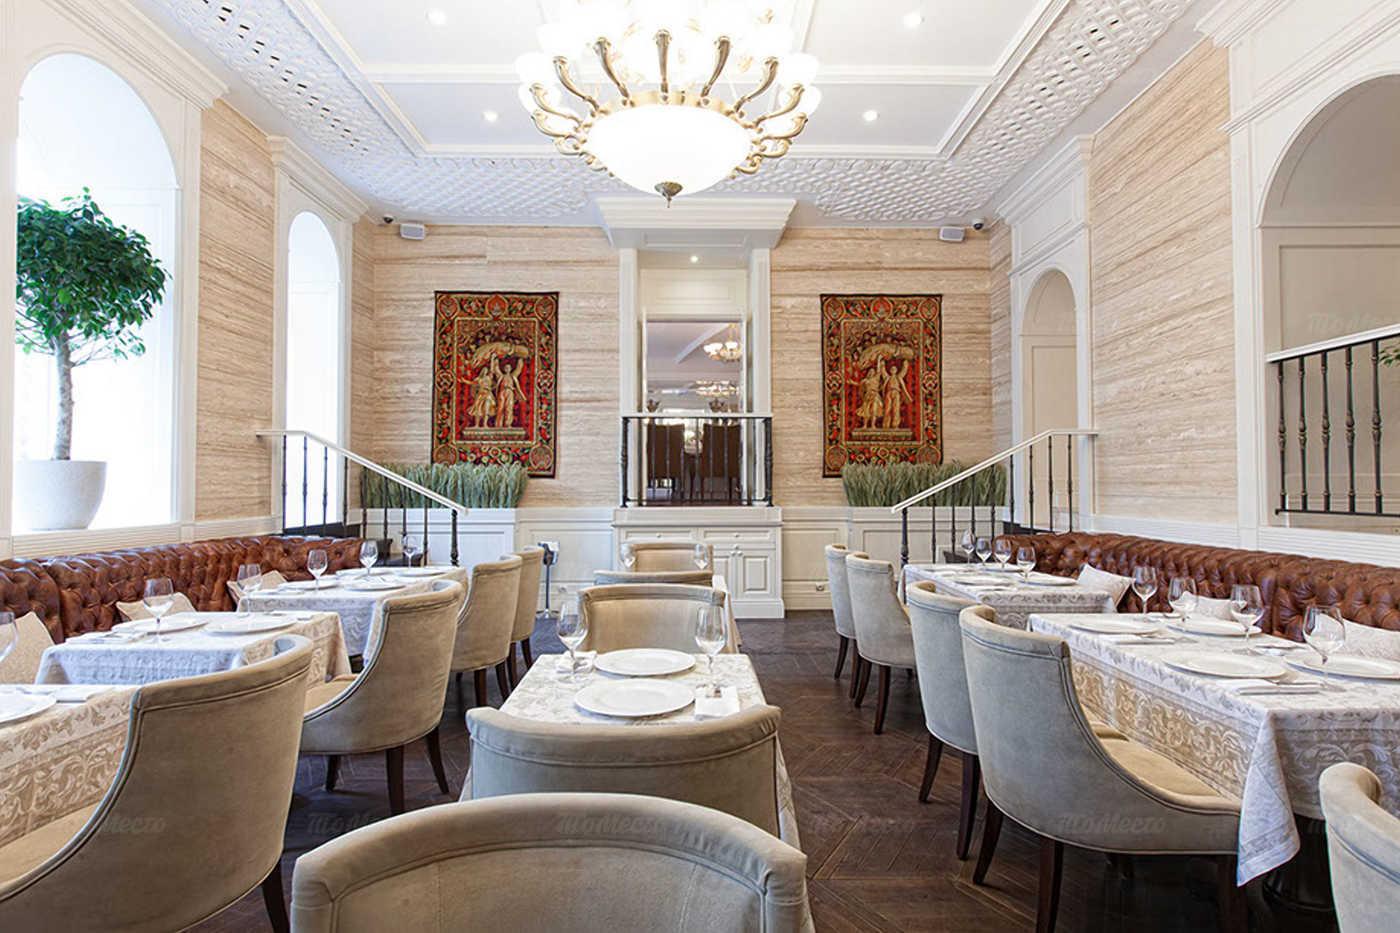 https://tomesto.ru/img/place/000/022/476/restoran-aragvi-na-tverskoy-ulitse_f00ea_full-98887.jpg